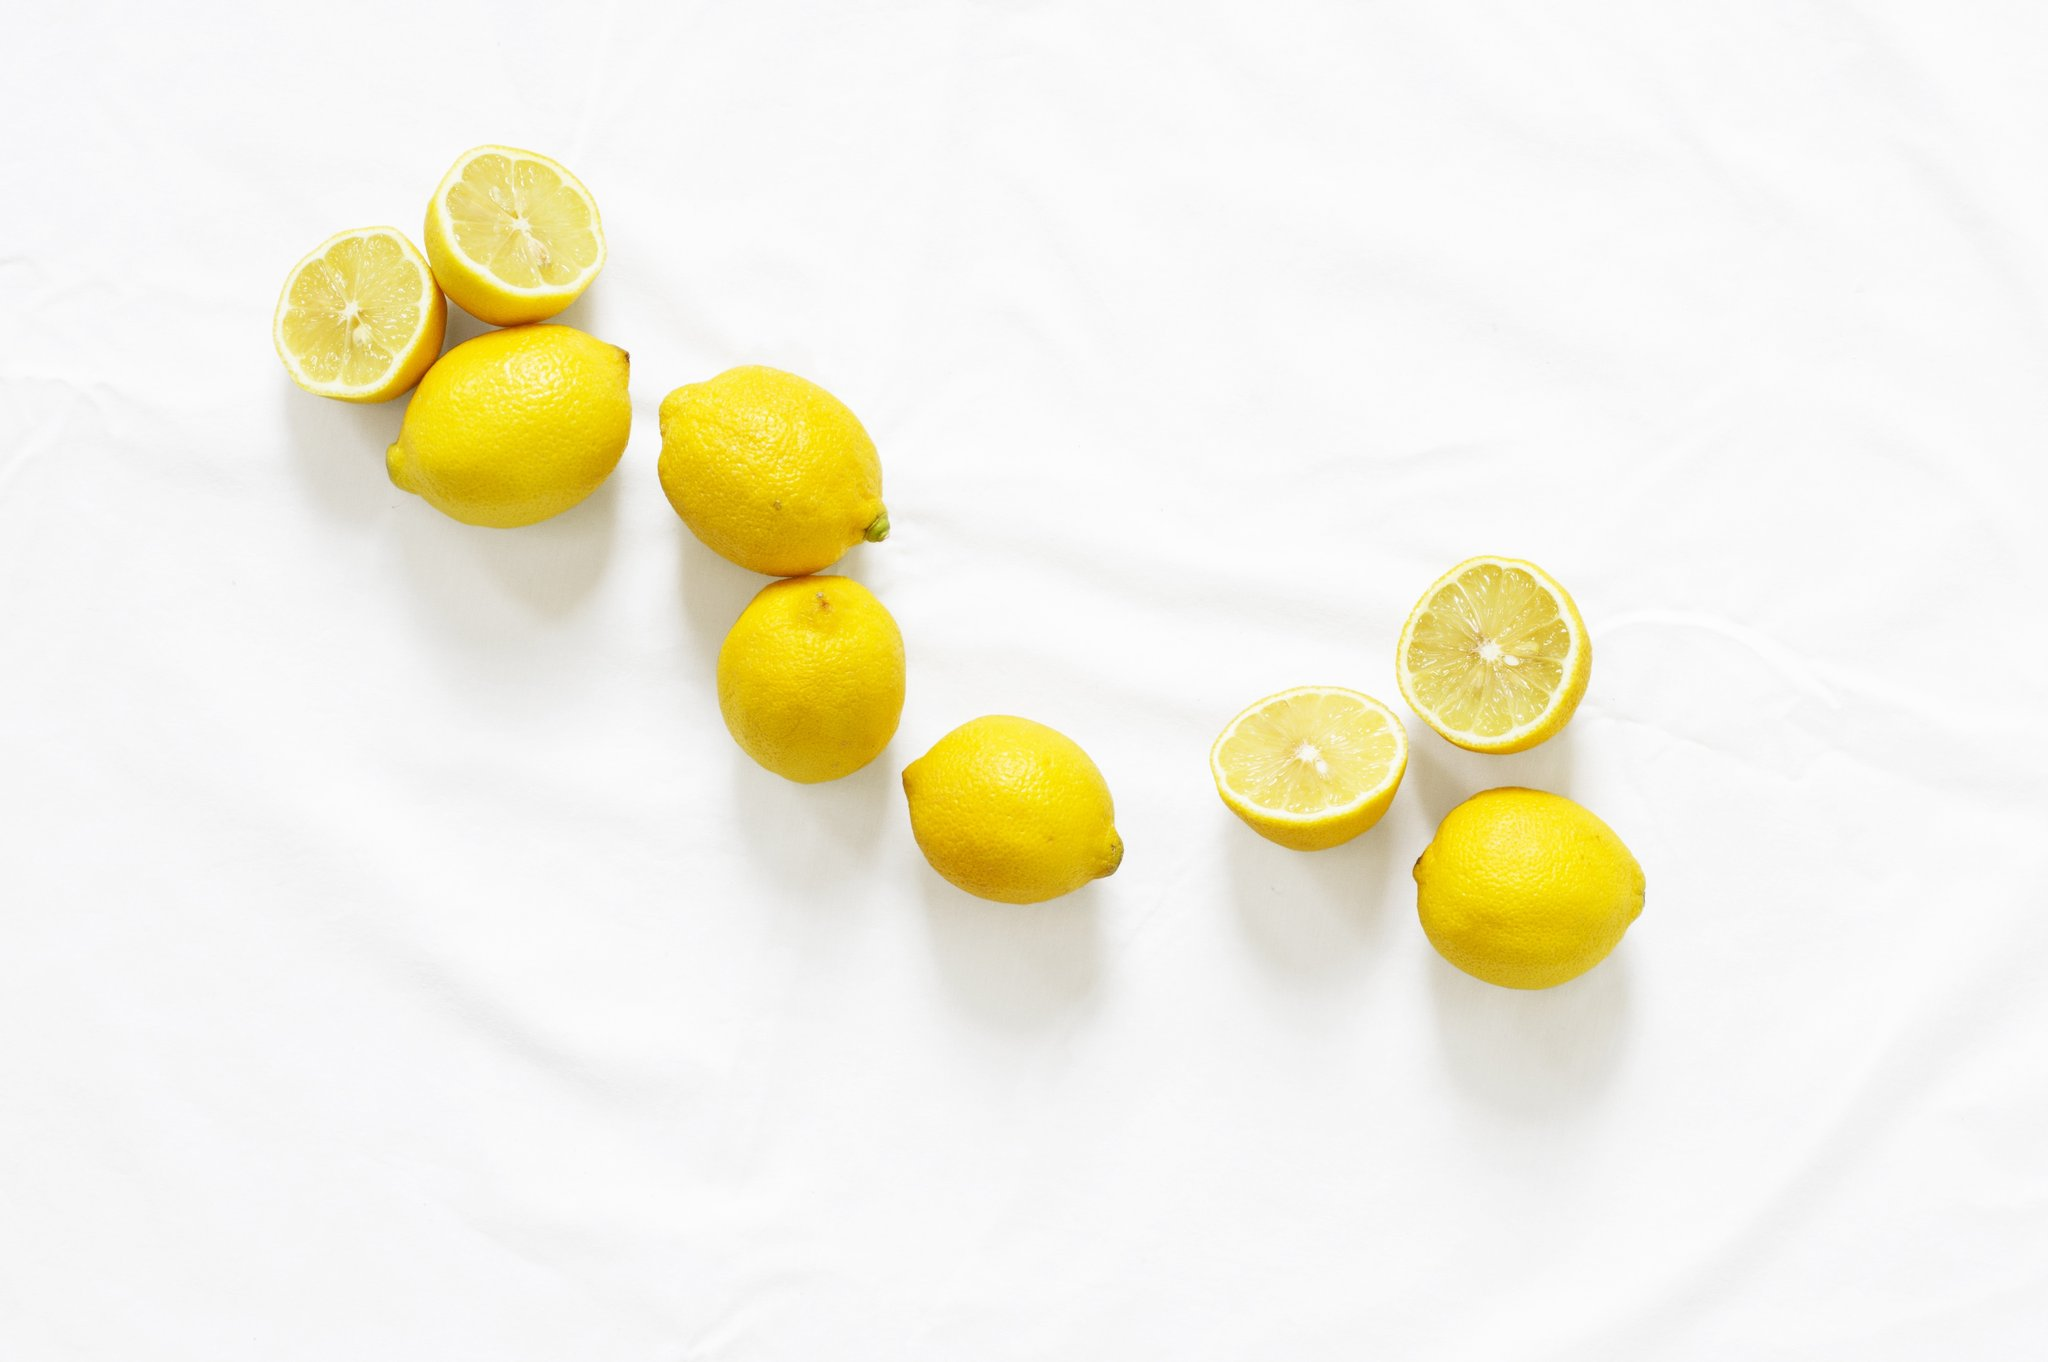 Damage to excessive lemon intake